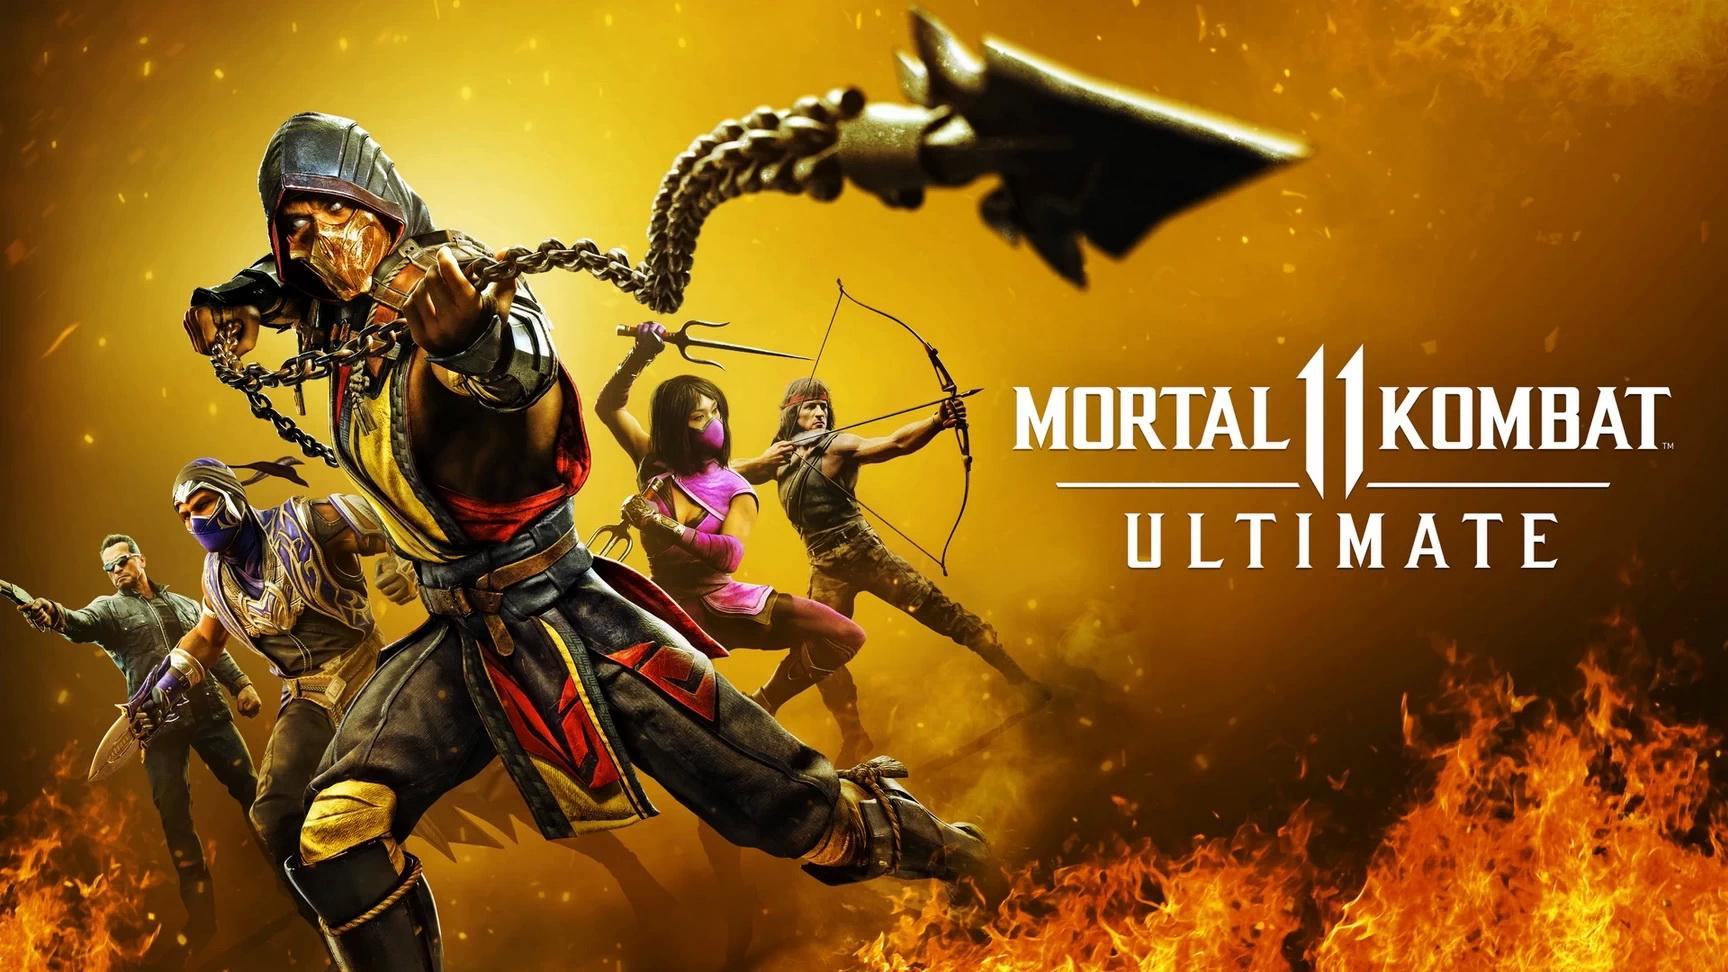 Mortal Kombat 11 Ultimate - Test